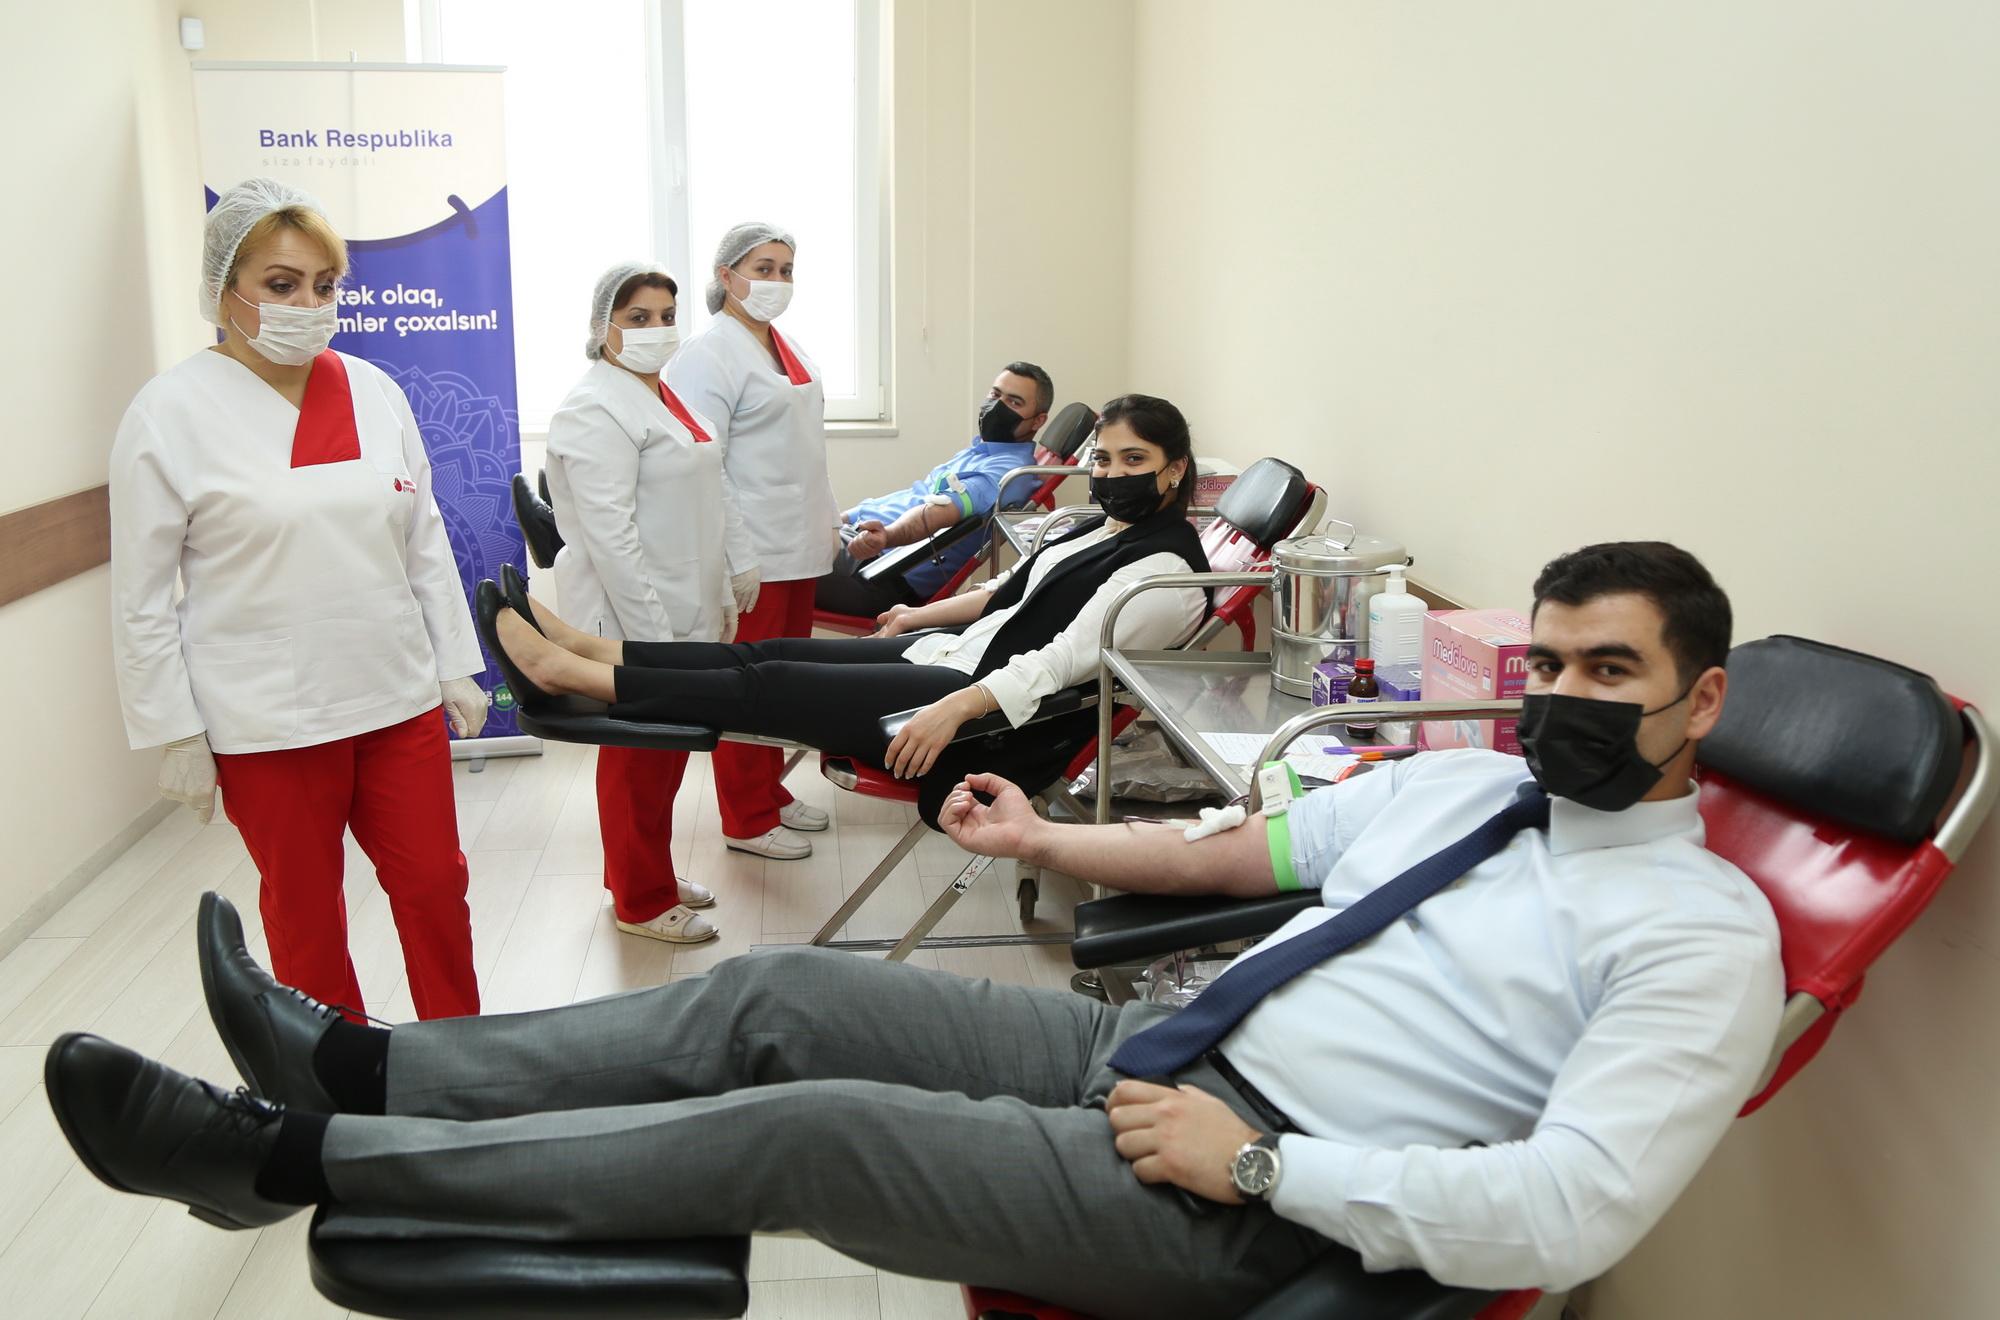 Сотрудники Банк Республика приняли участие в акции по сдаче донорской крови